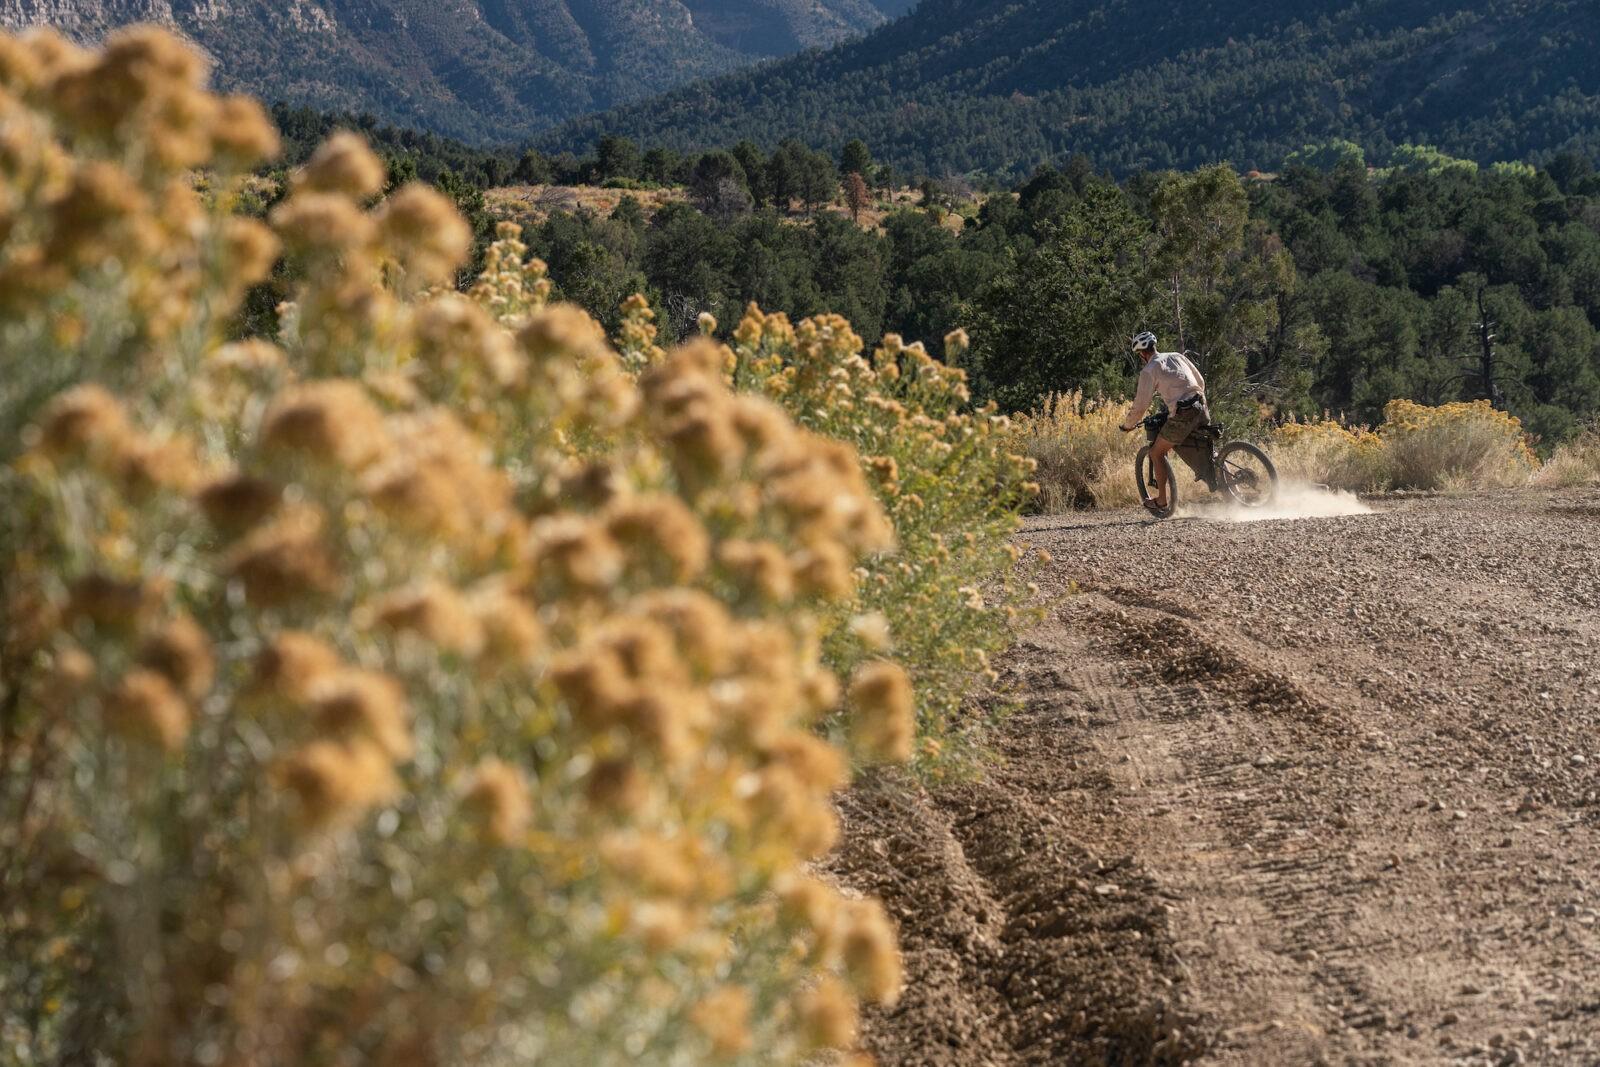 Ute Mountain Ute Tribal Park Bikepacking Tour featured in The Radavist